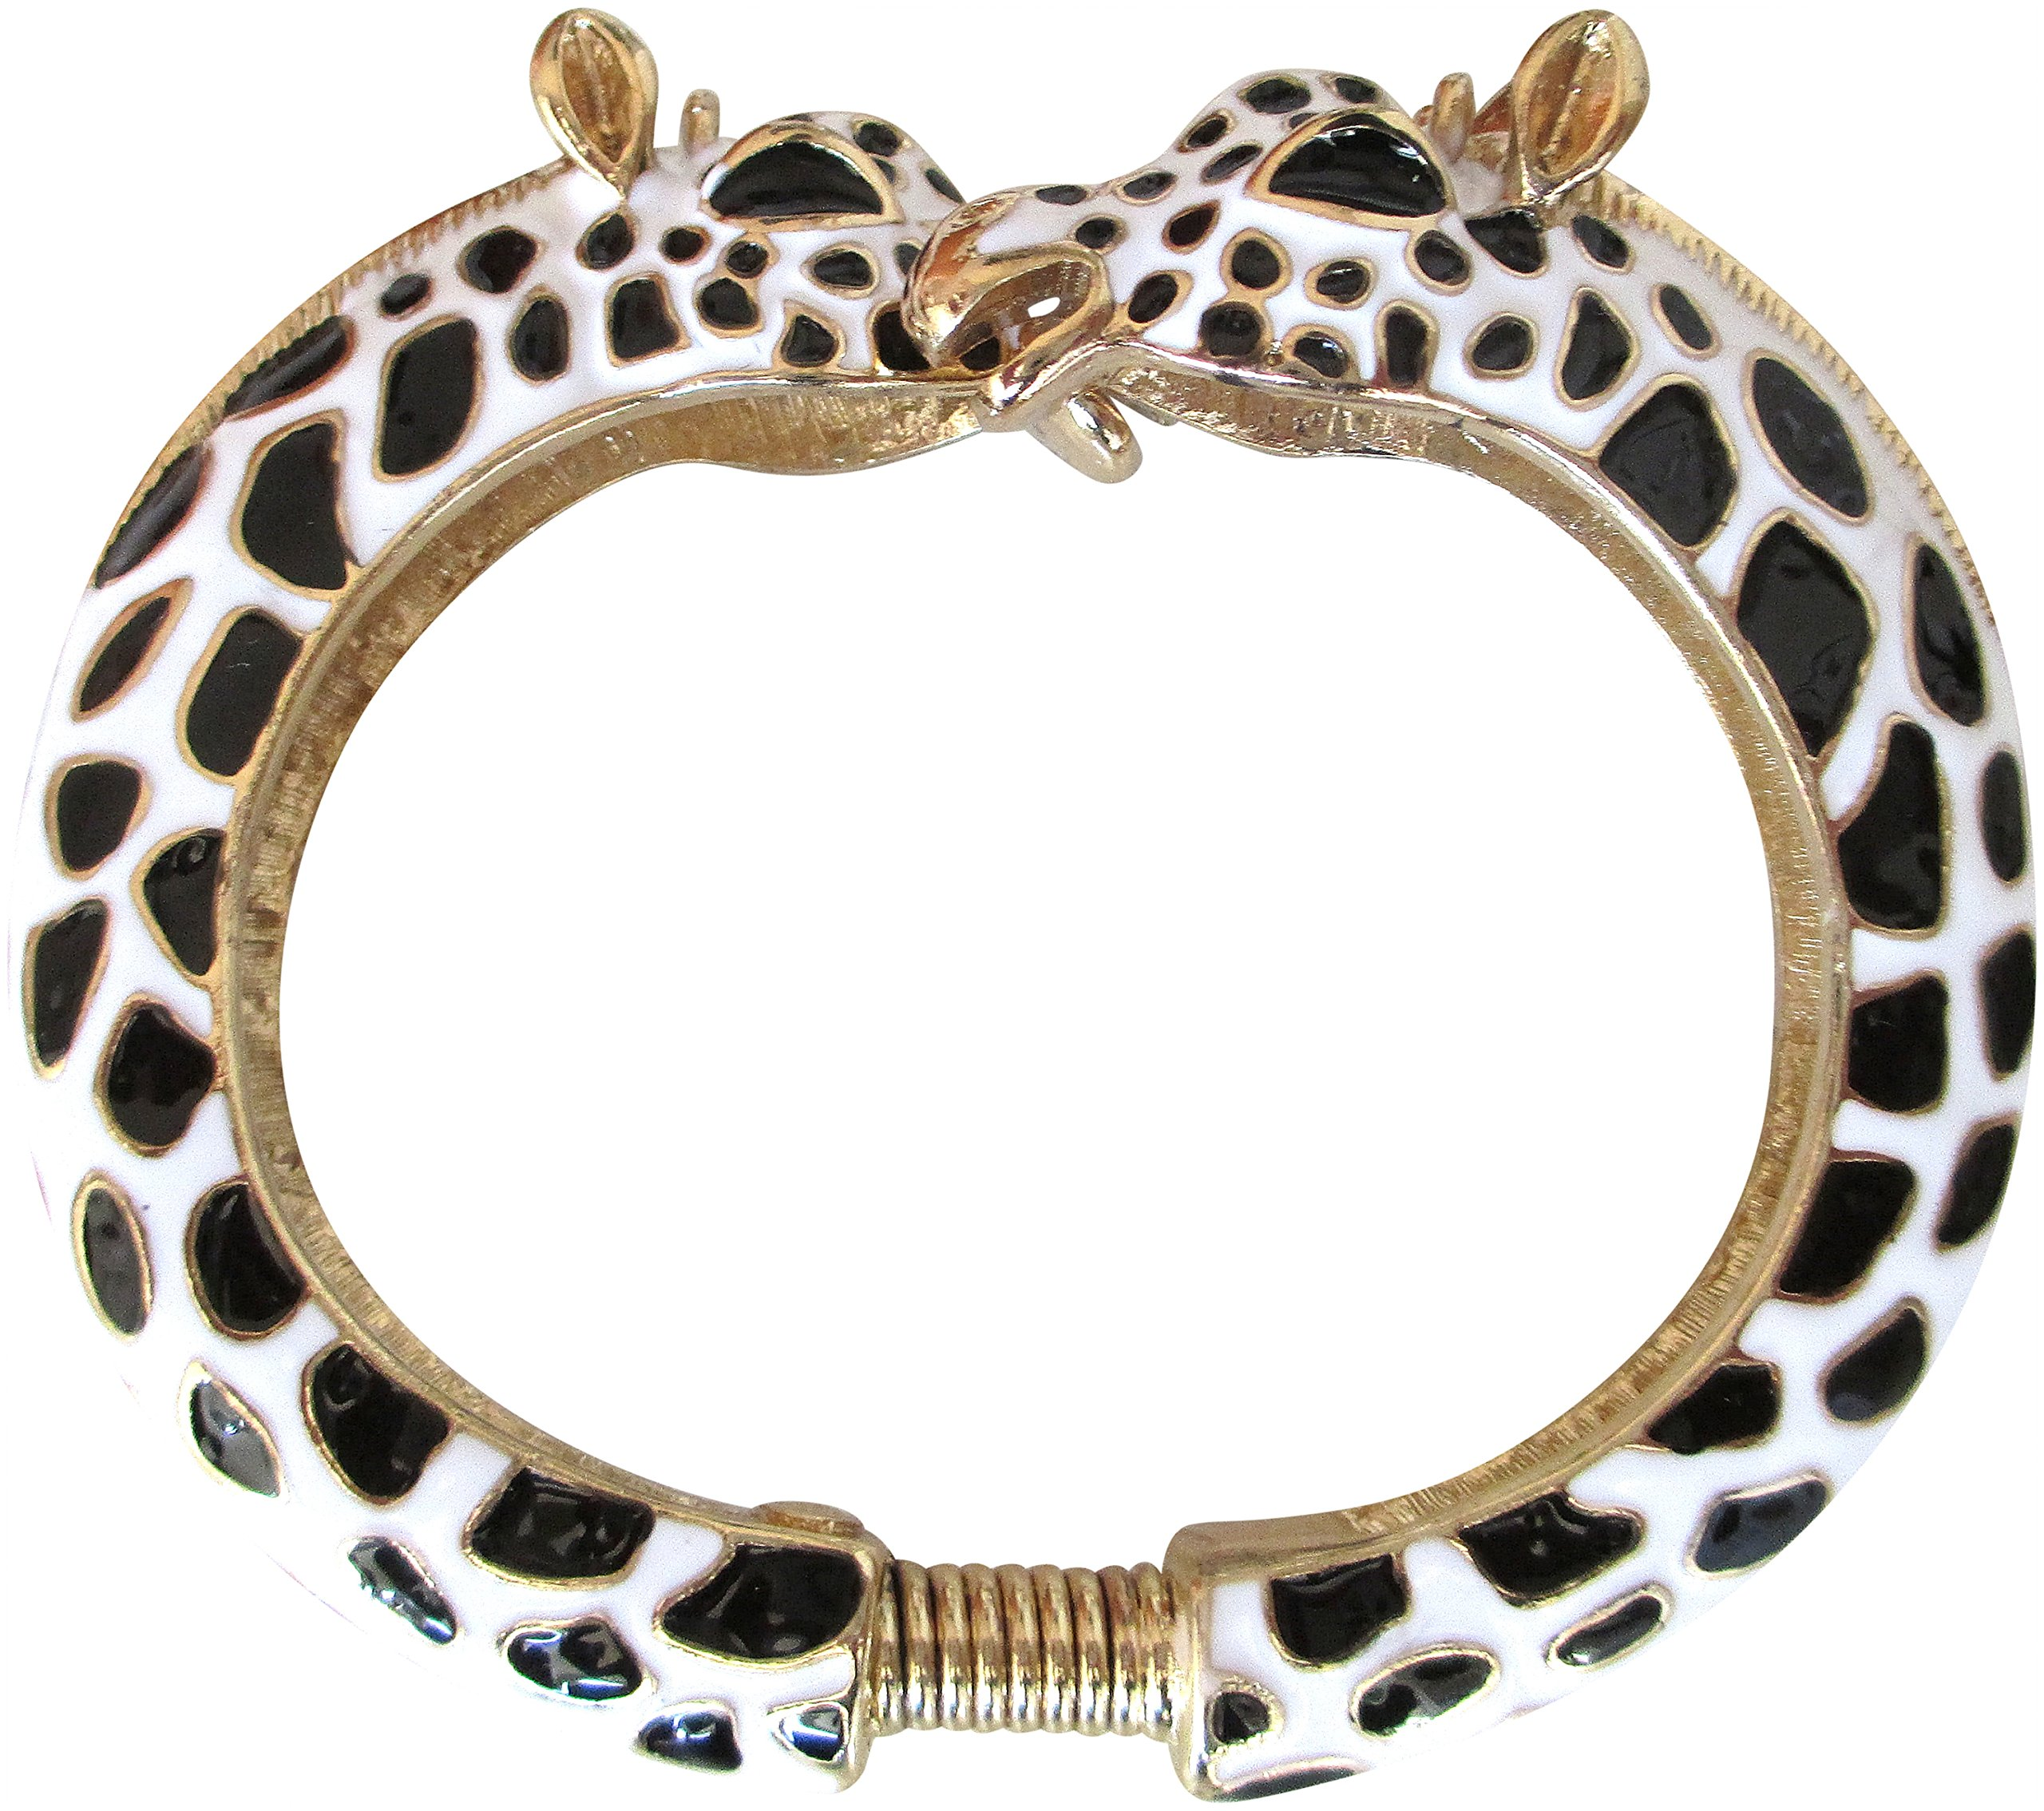 Kenneth Jay Lane Black & White Giraffe Enamel Bypass Bangle Bracelet by Kenneth Jay Lane